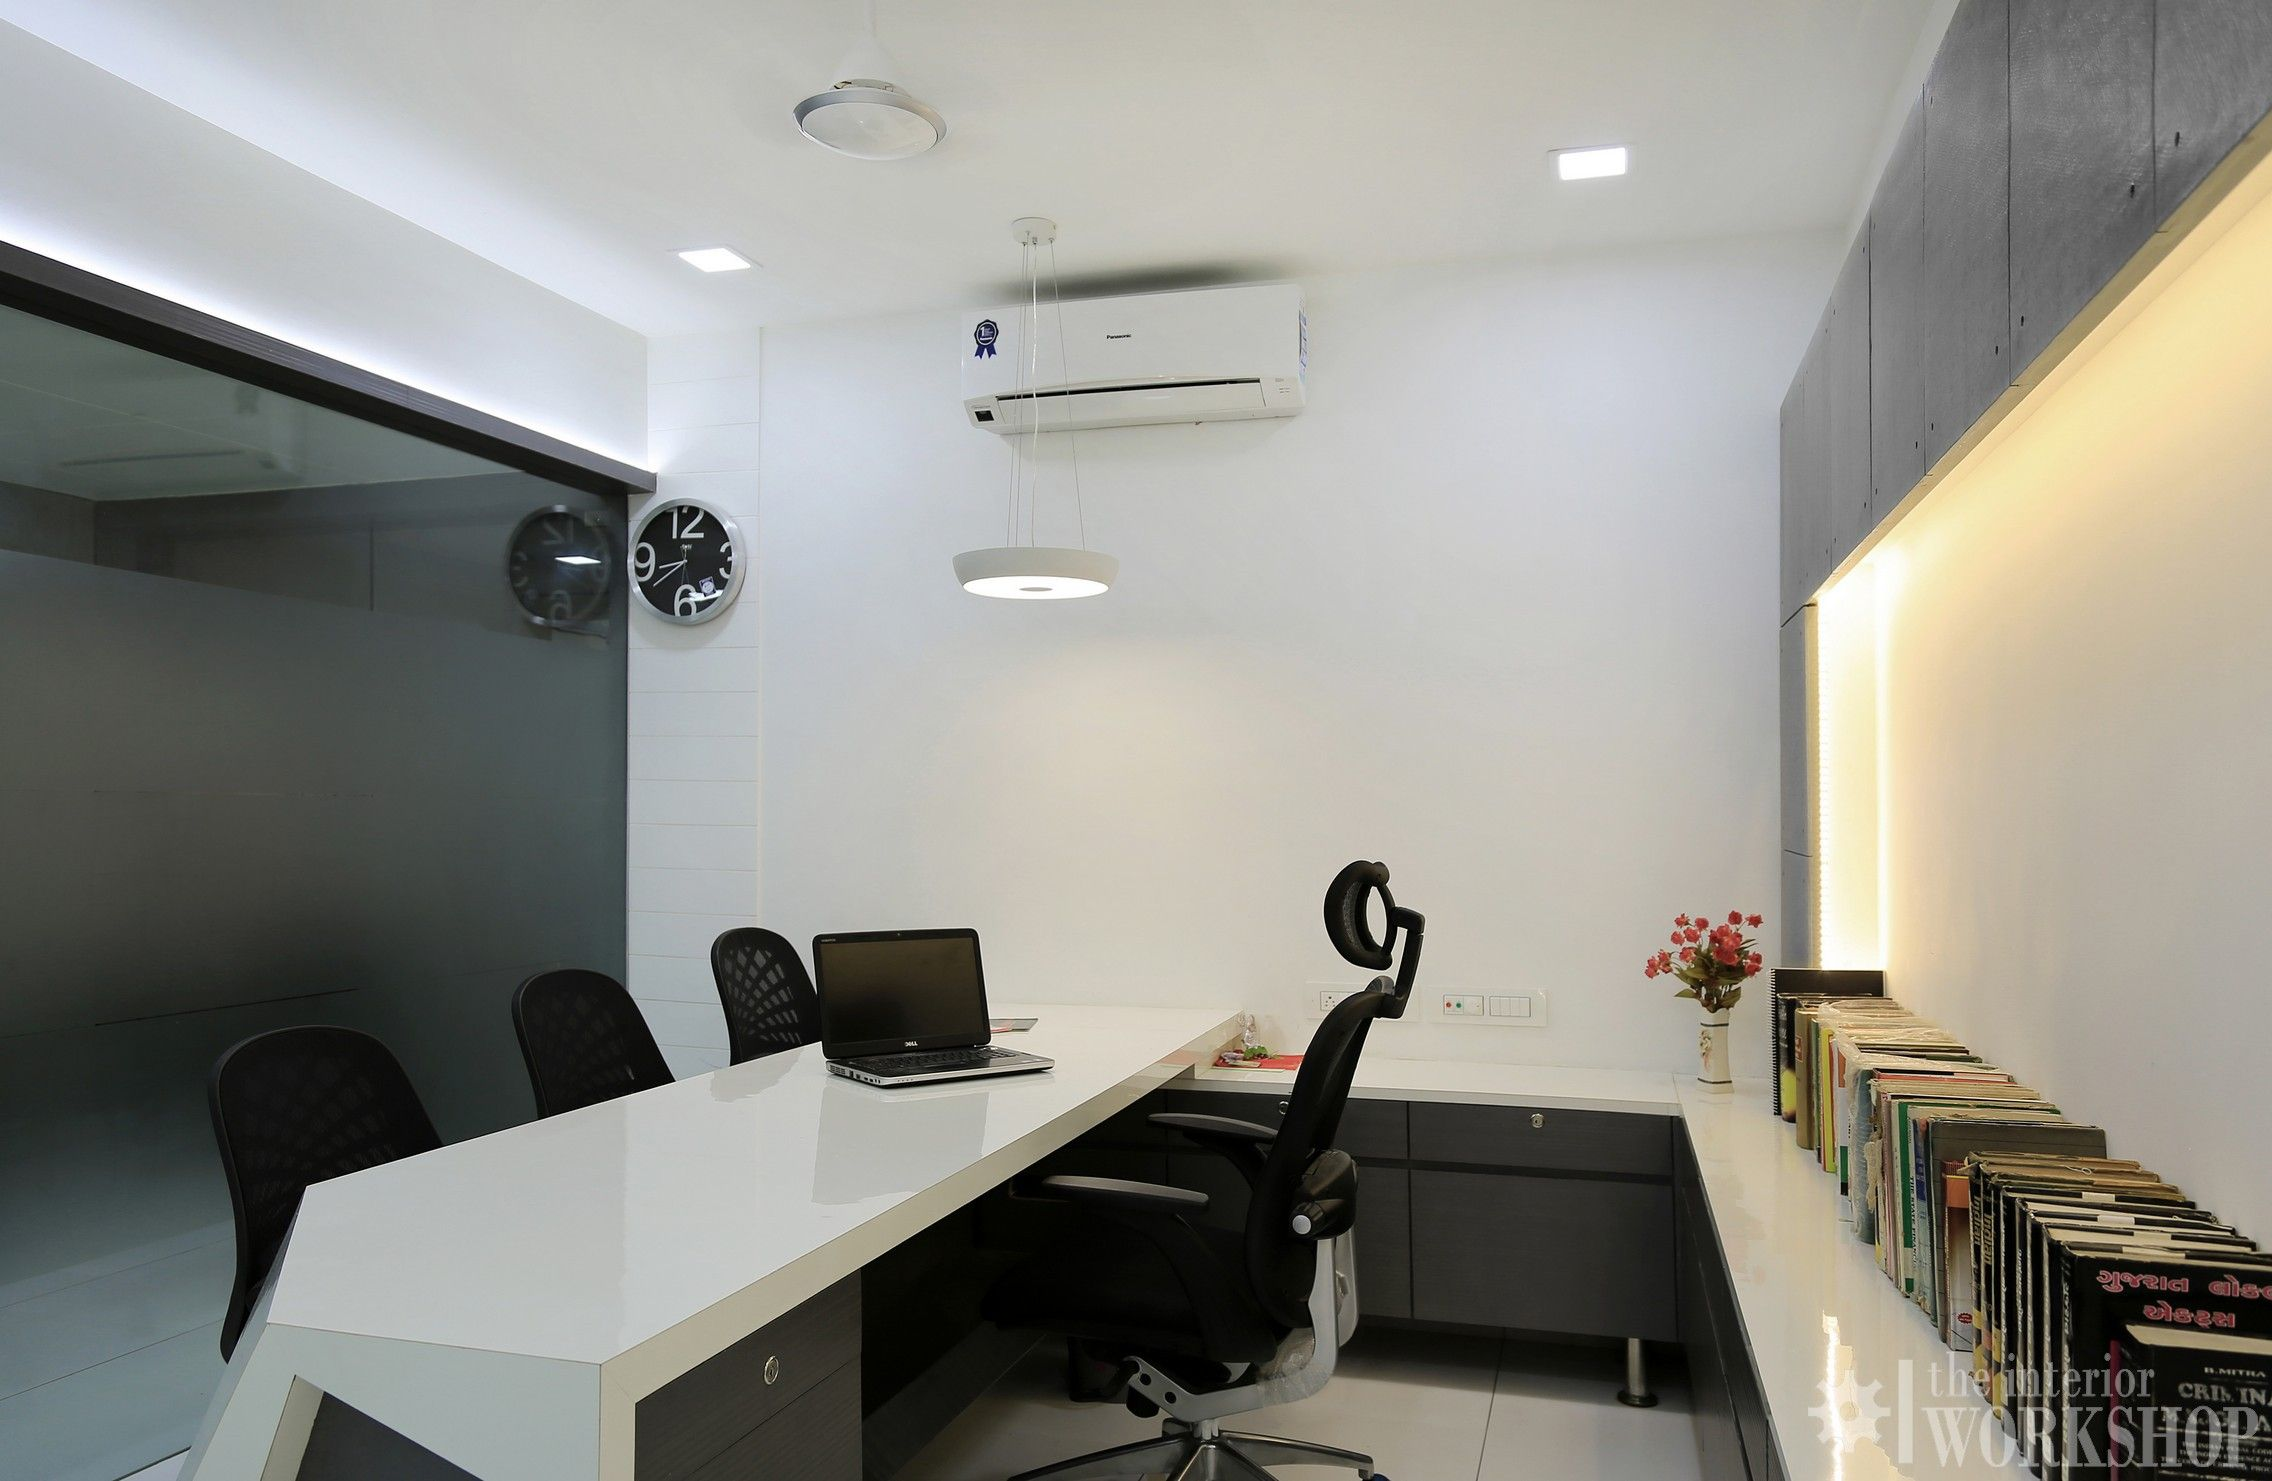 Dharmesh Chauhan The Interior Workshop In 2021 Interior Interior Design Office Interiors